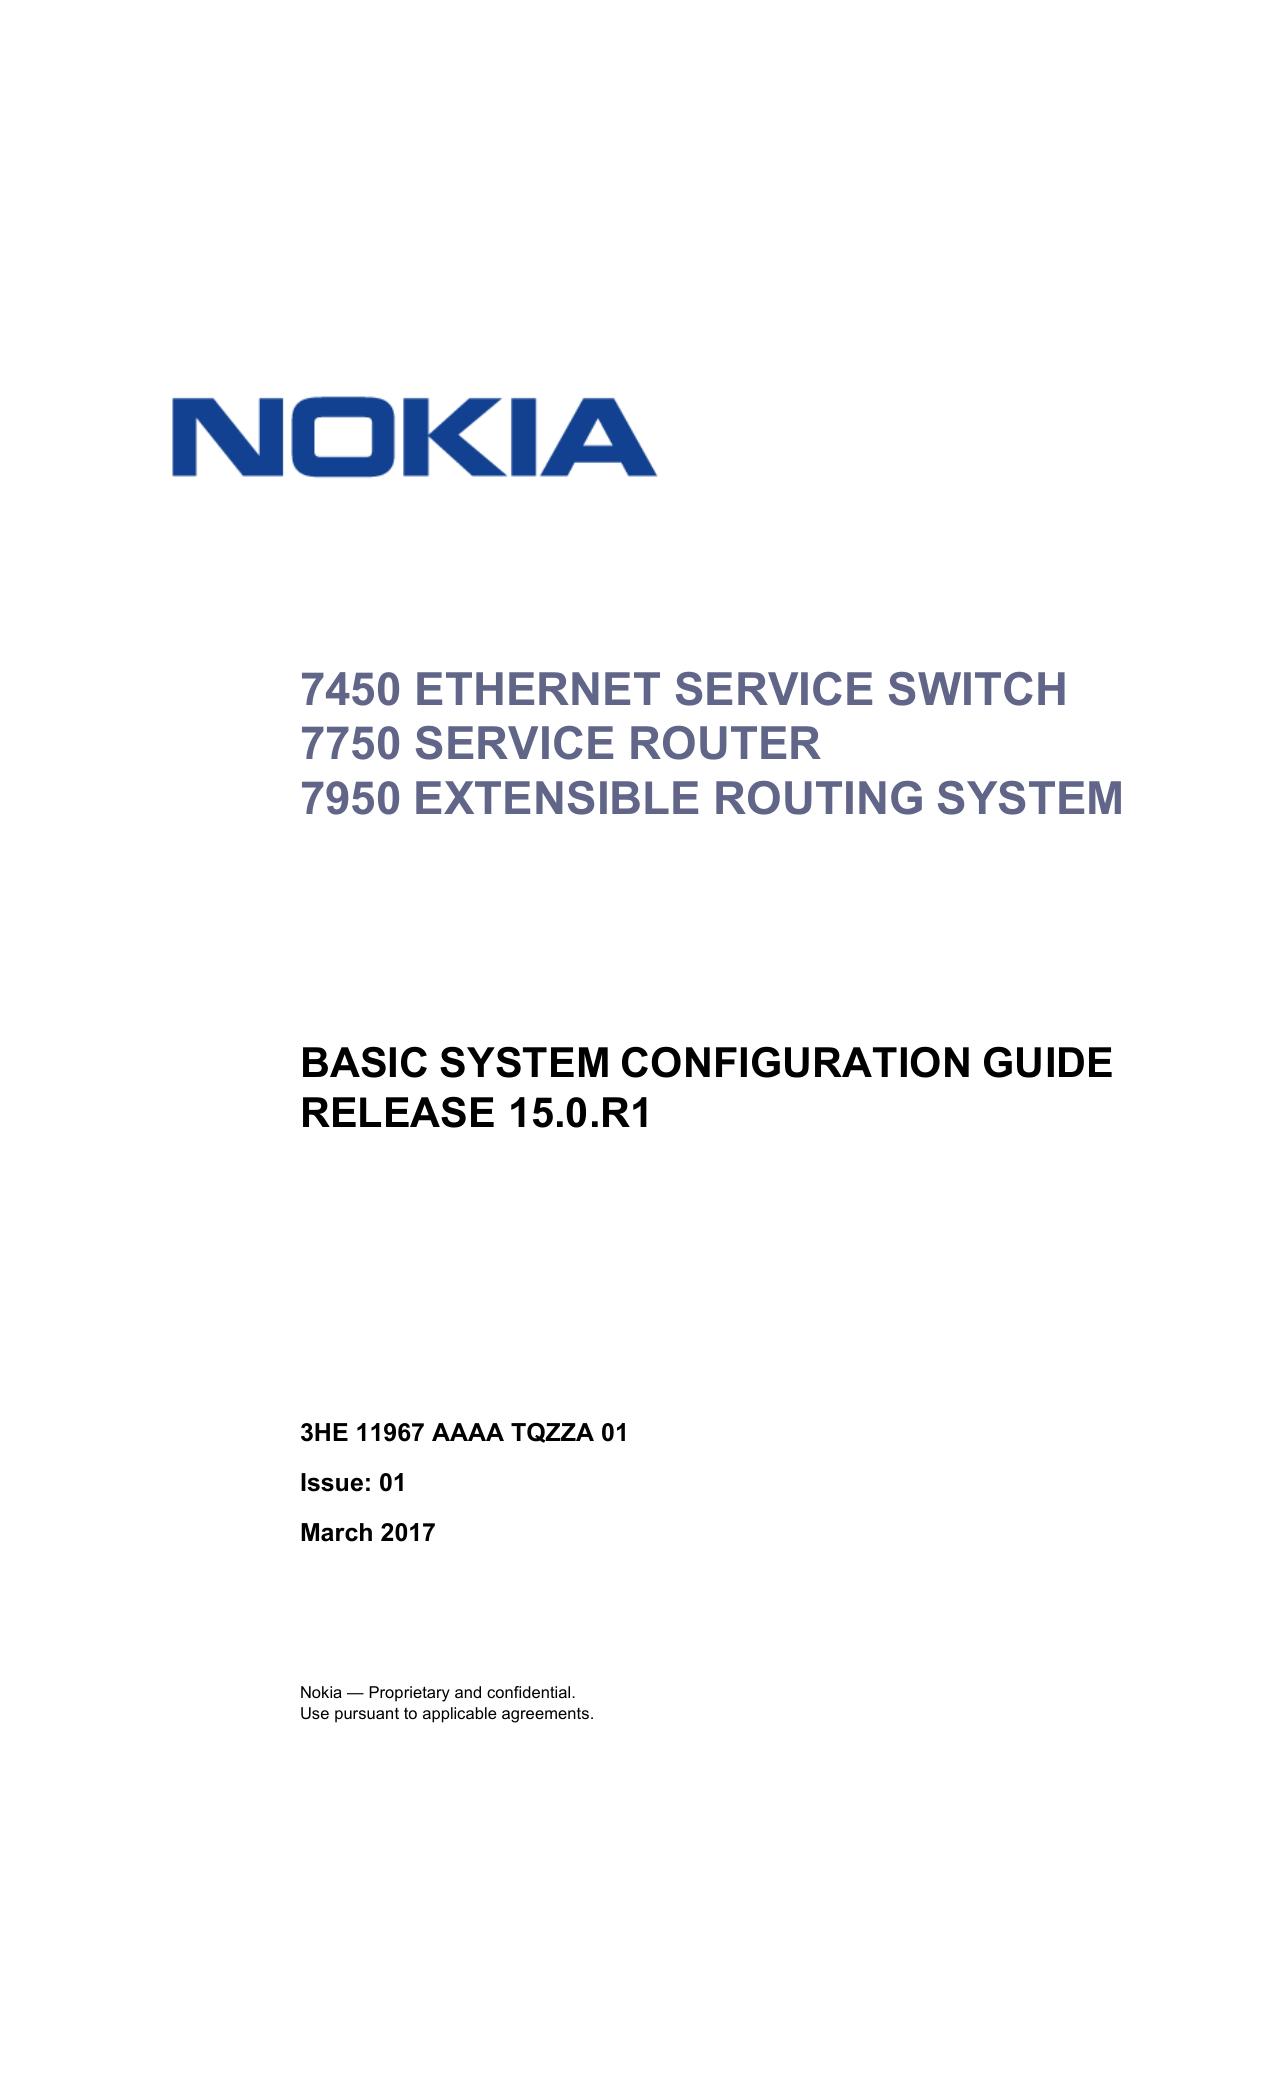 Basic System Configuration Guide R15 0 R1 - Alcatel | manualzz com